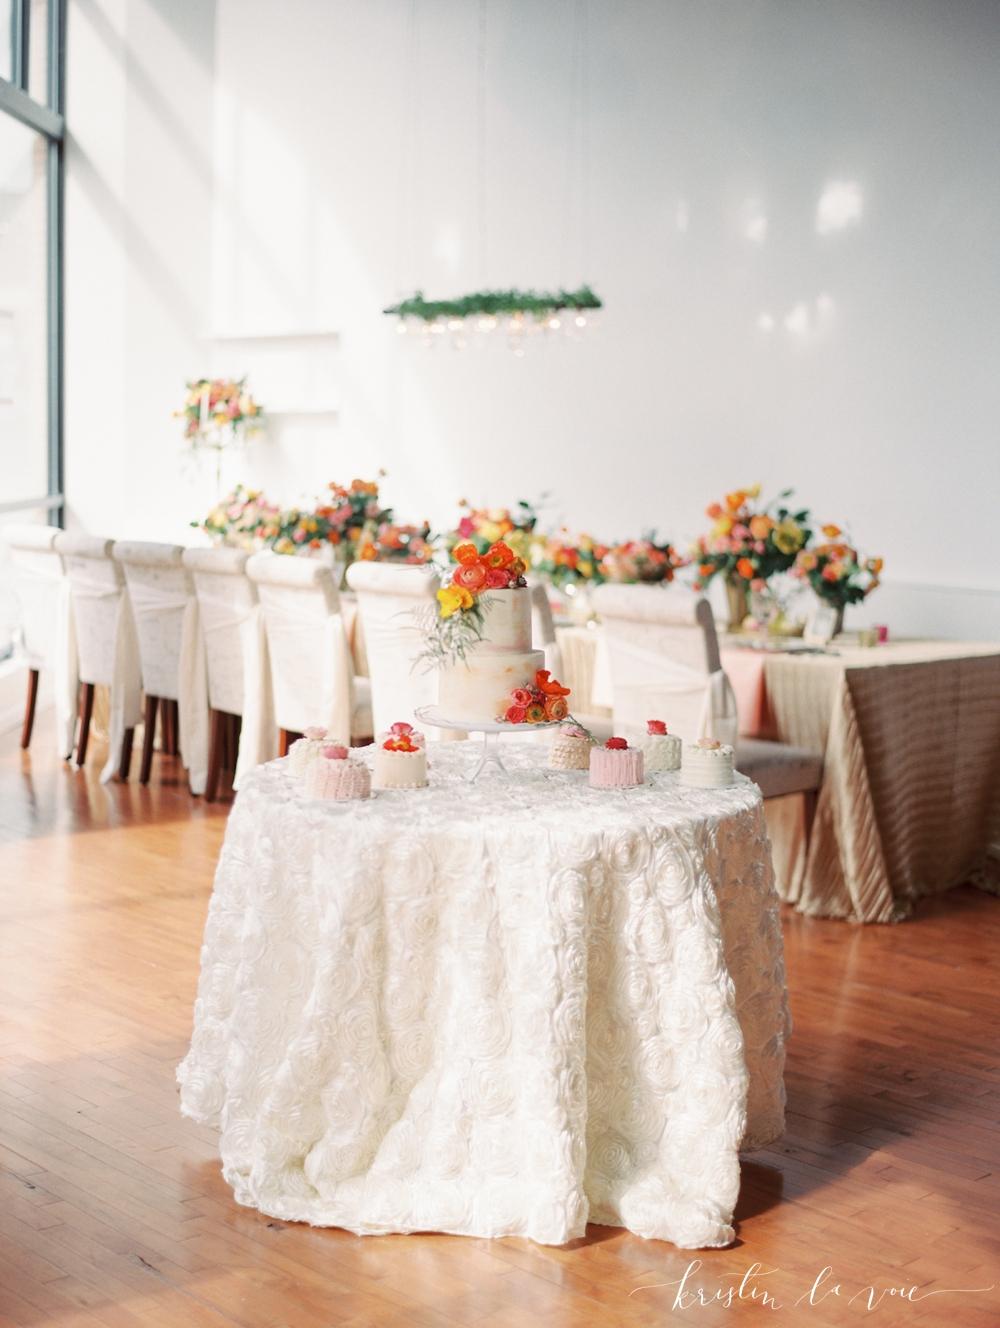 Kristin-La-Voie-Photography-Chicago-Wedding-Photographer-Poppy-Ballerina-140.jpg